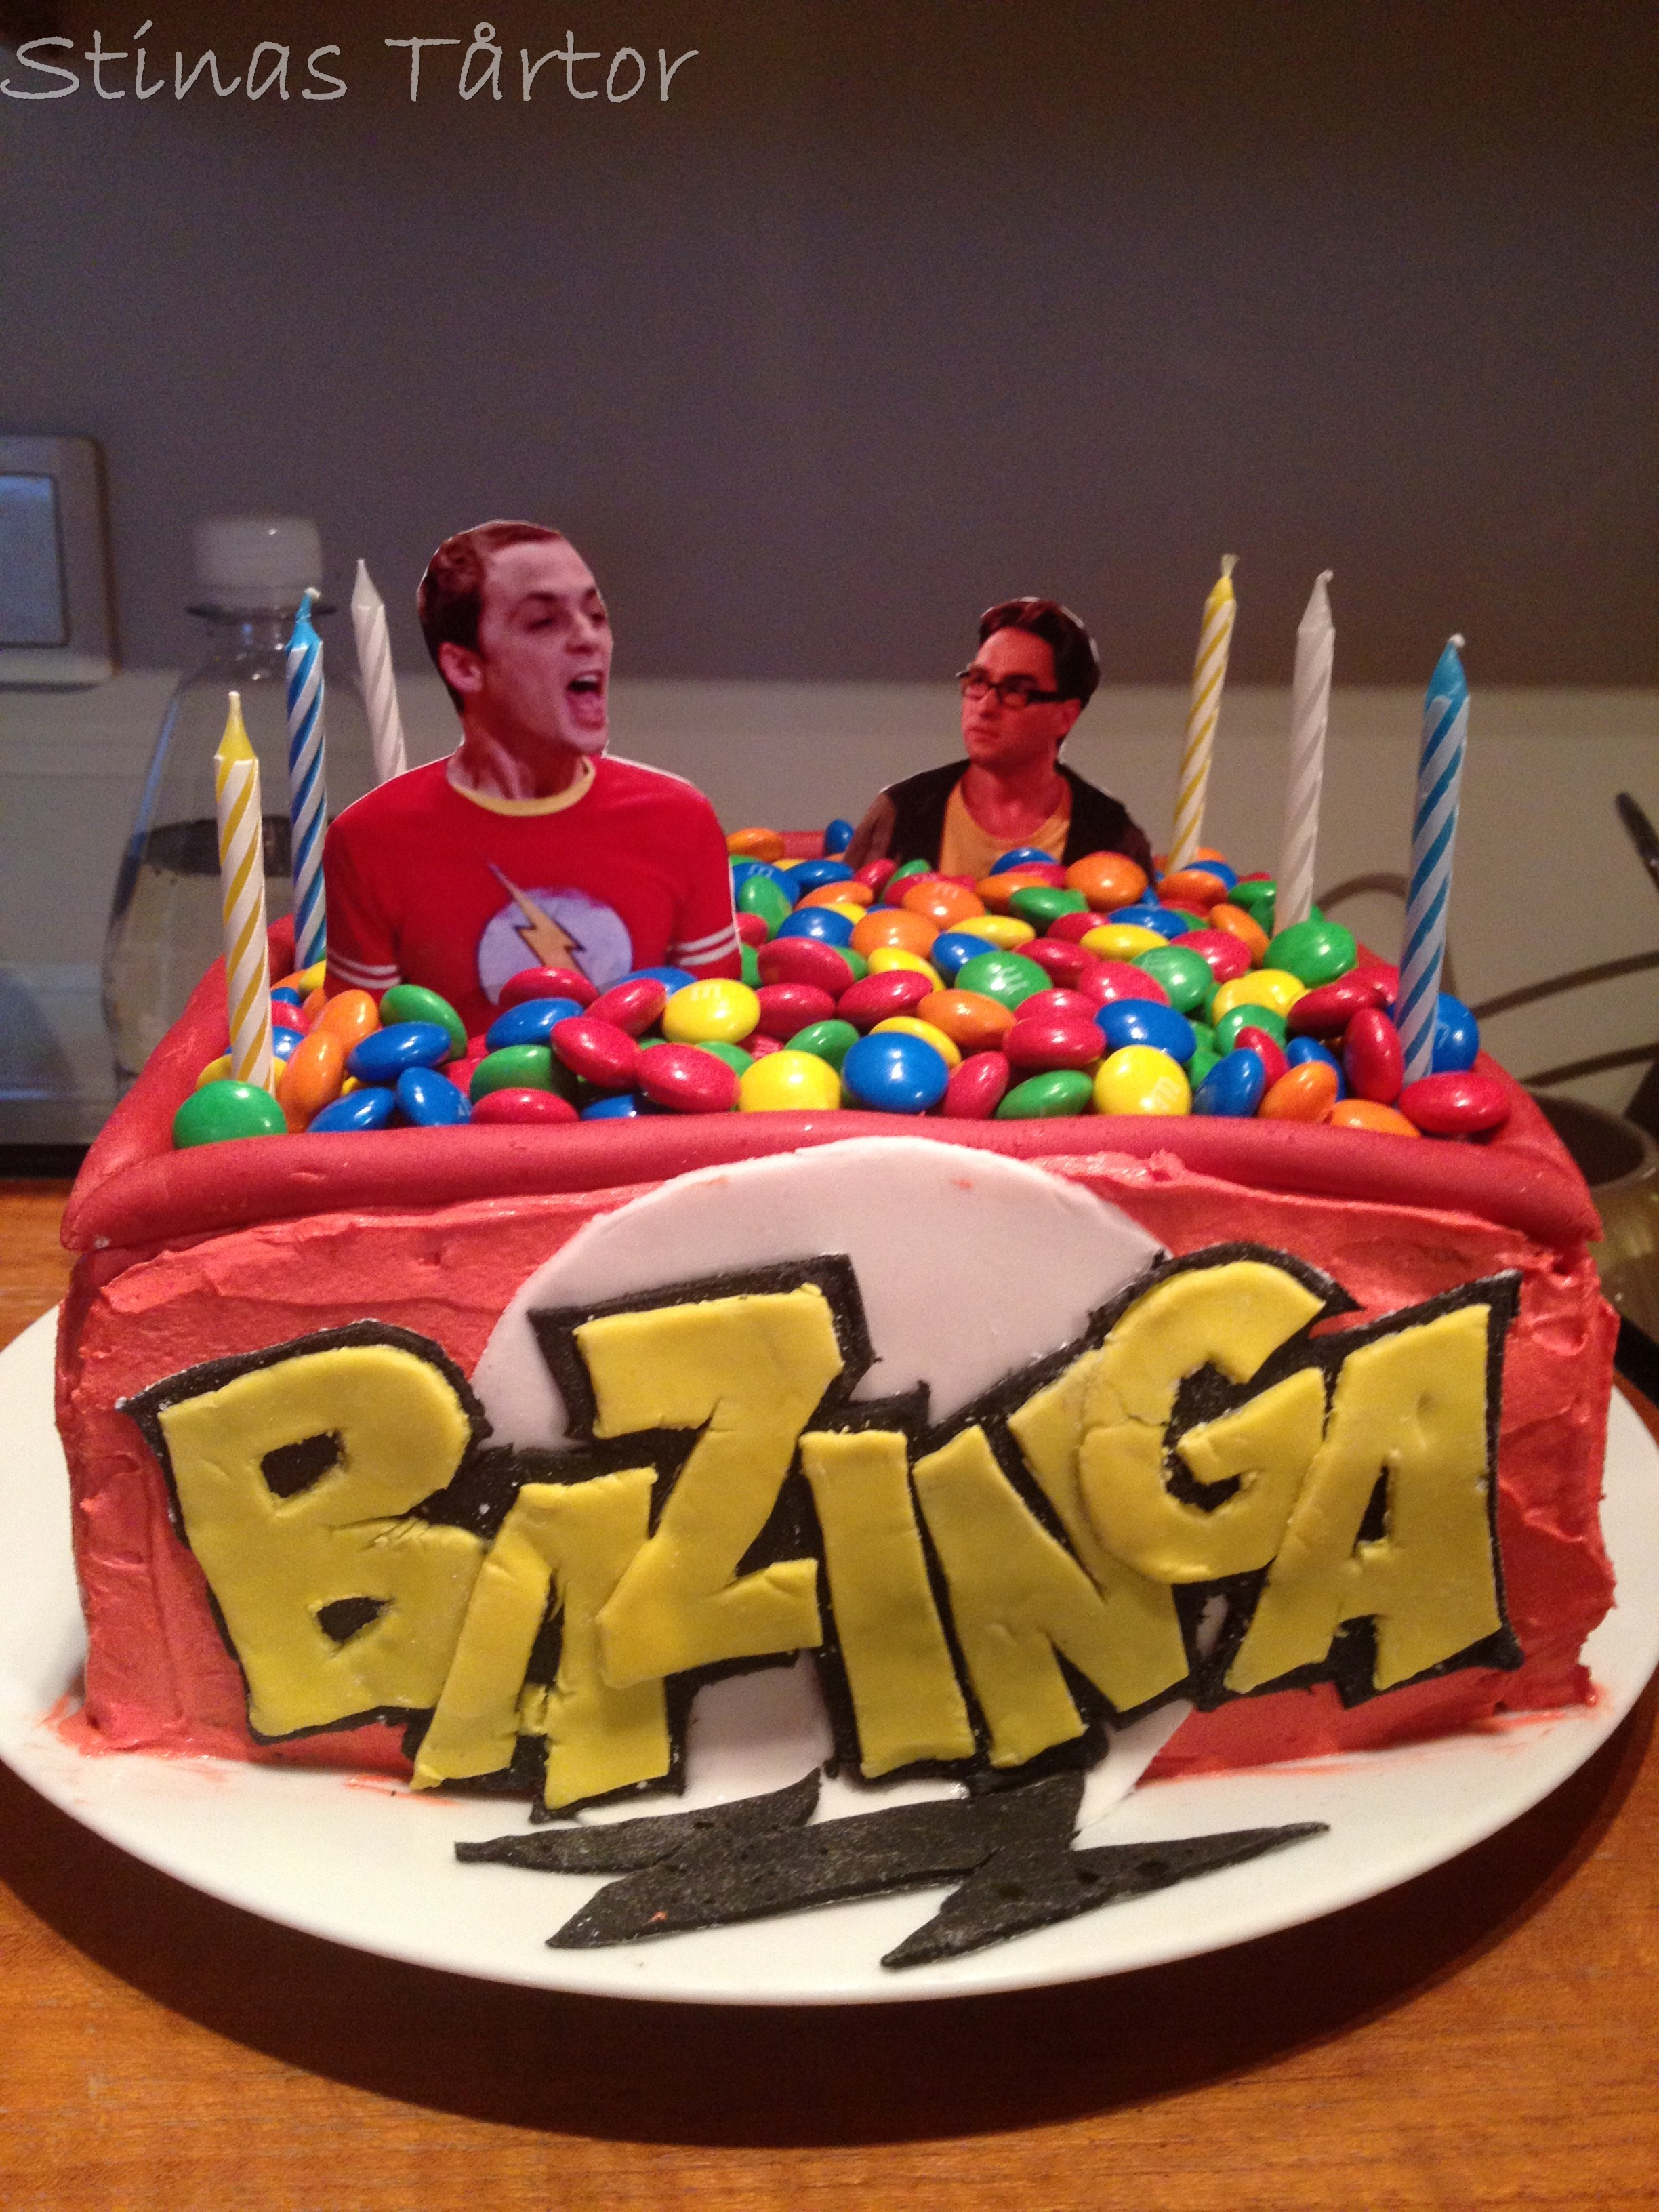 Birthday Cake Design For Big Brother : januari 2014 Stinas Tartor